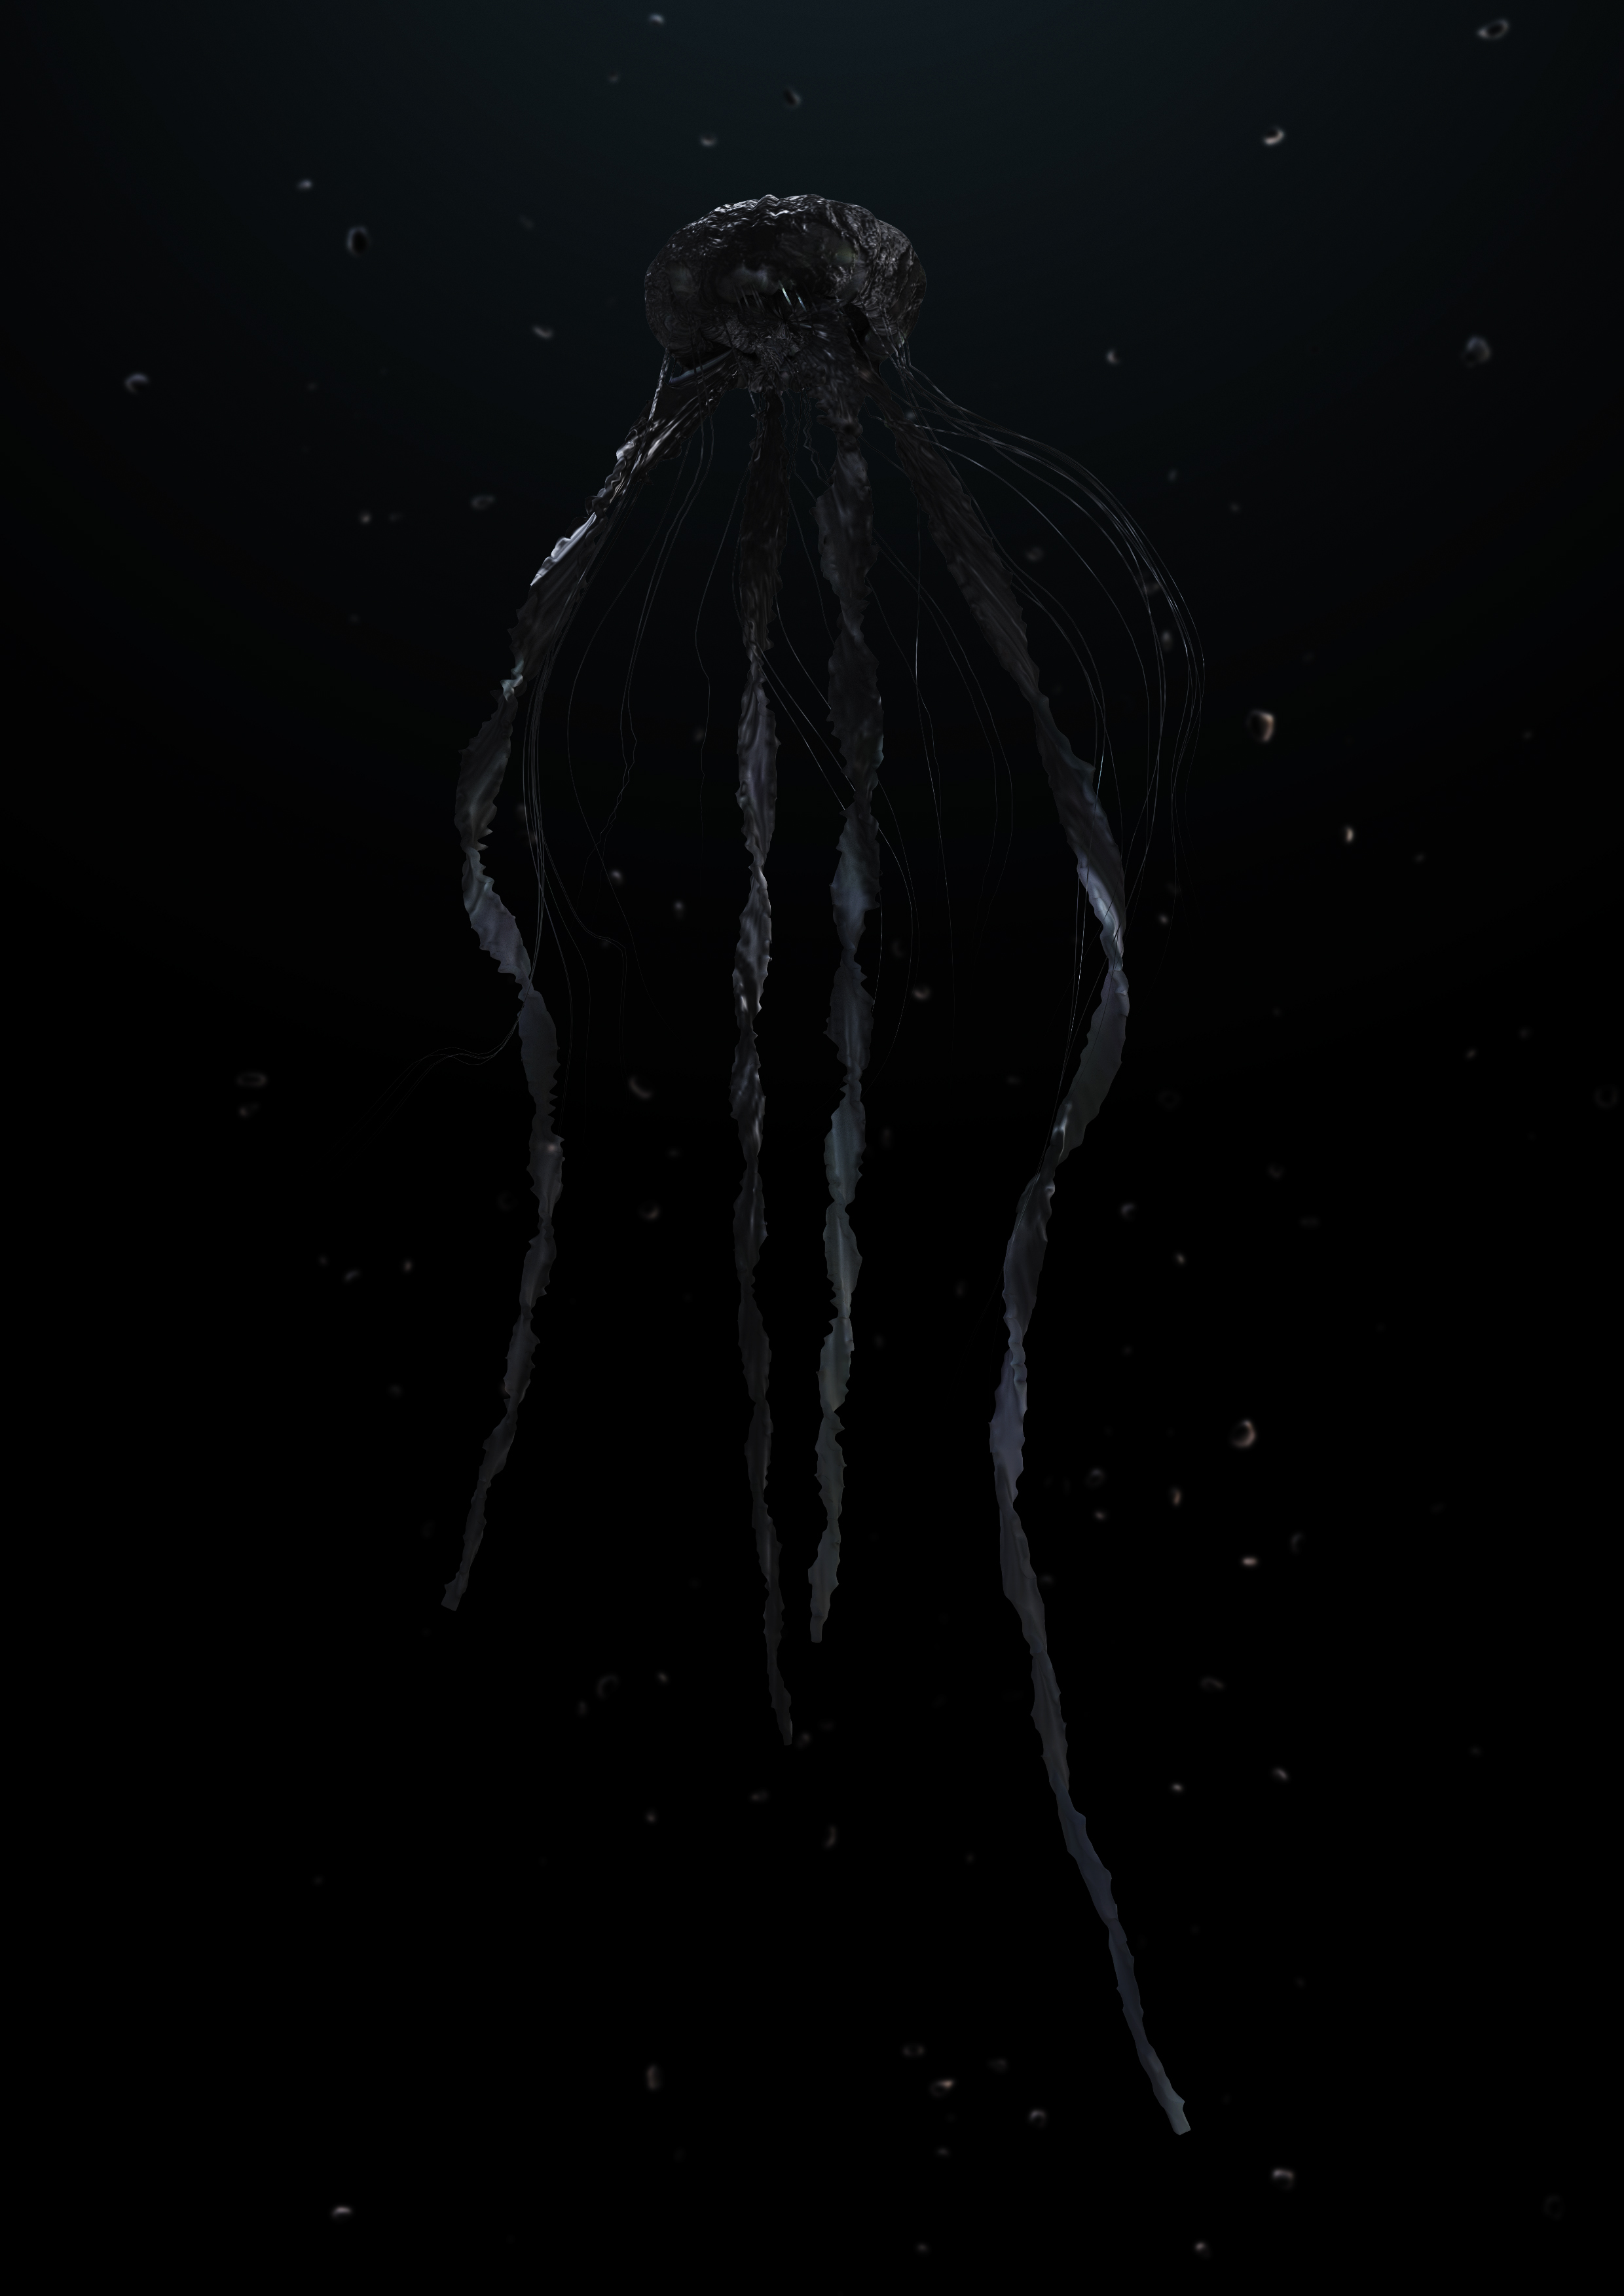 160530_Jellyfish-black-03